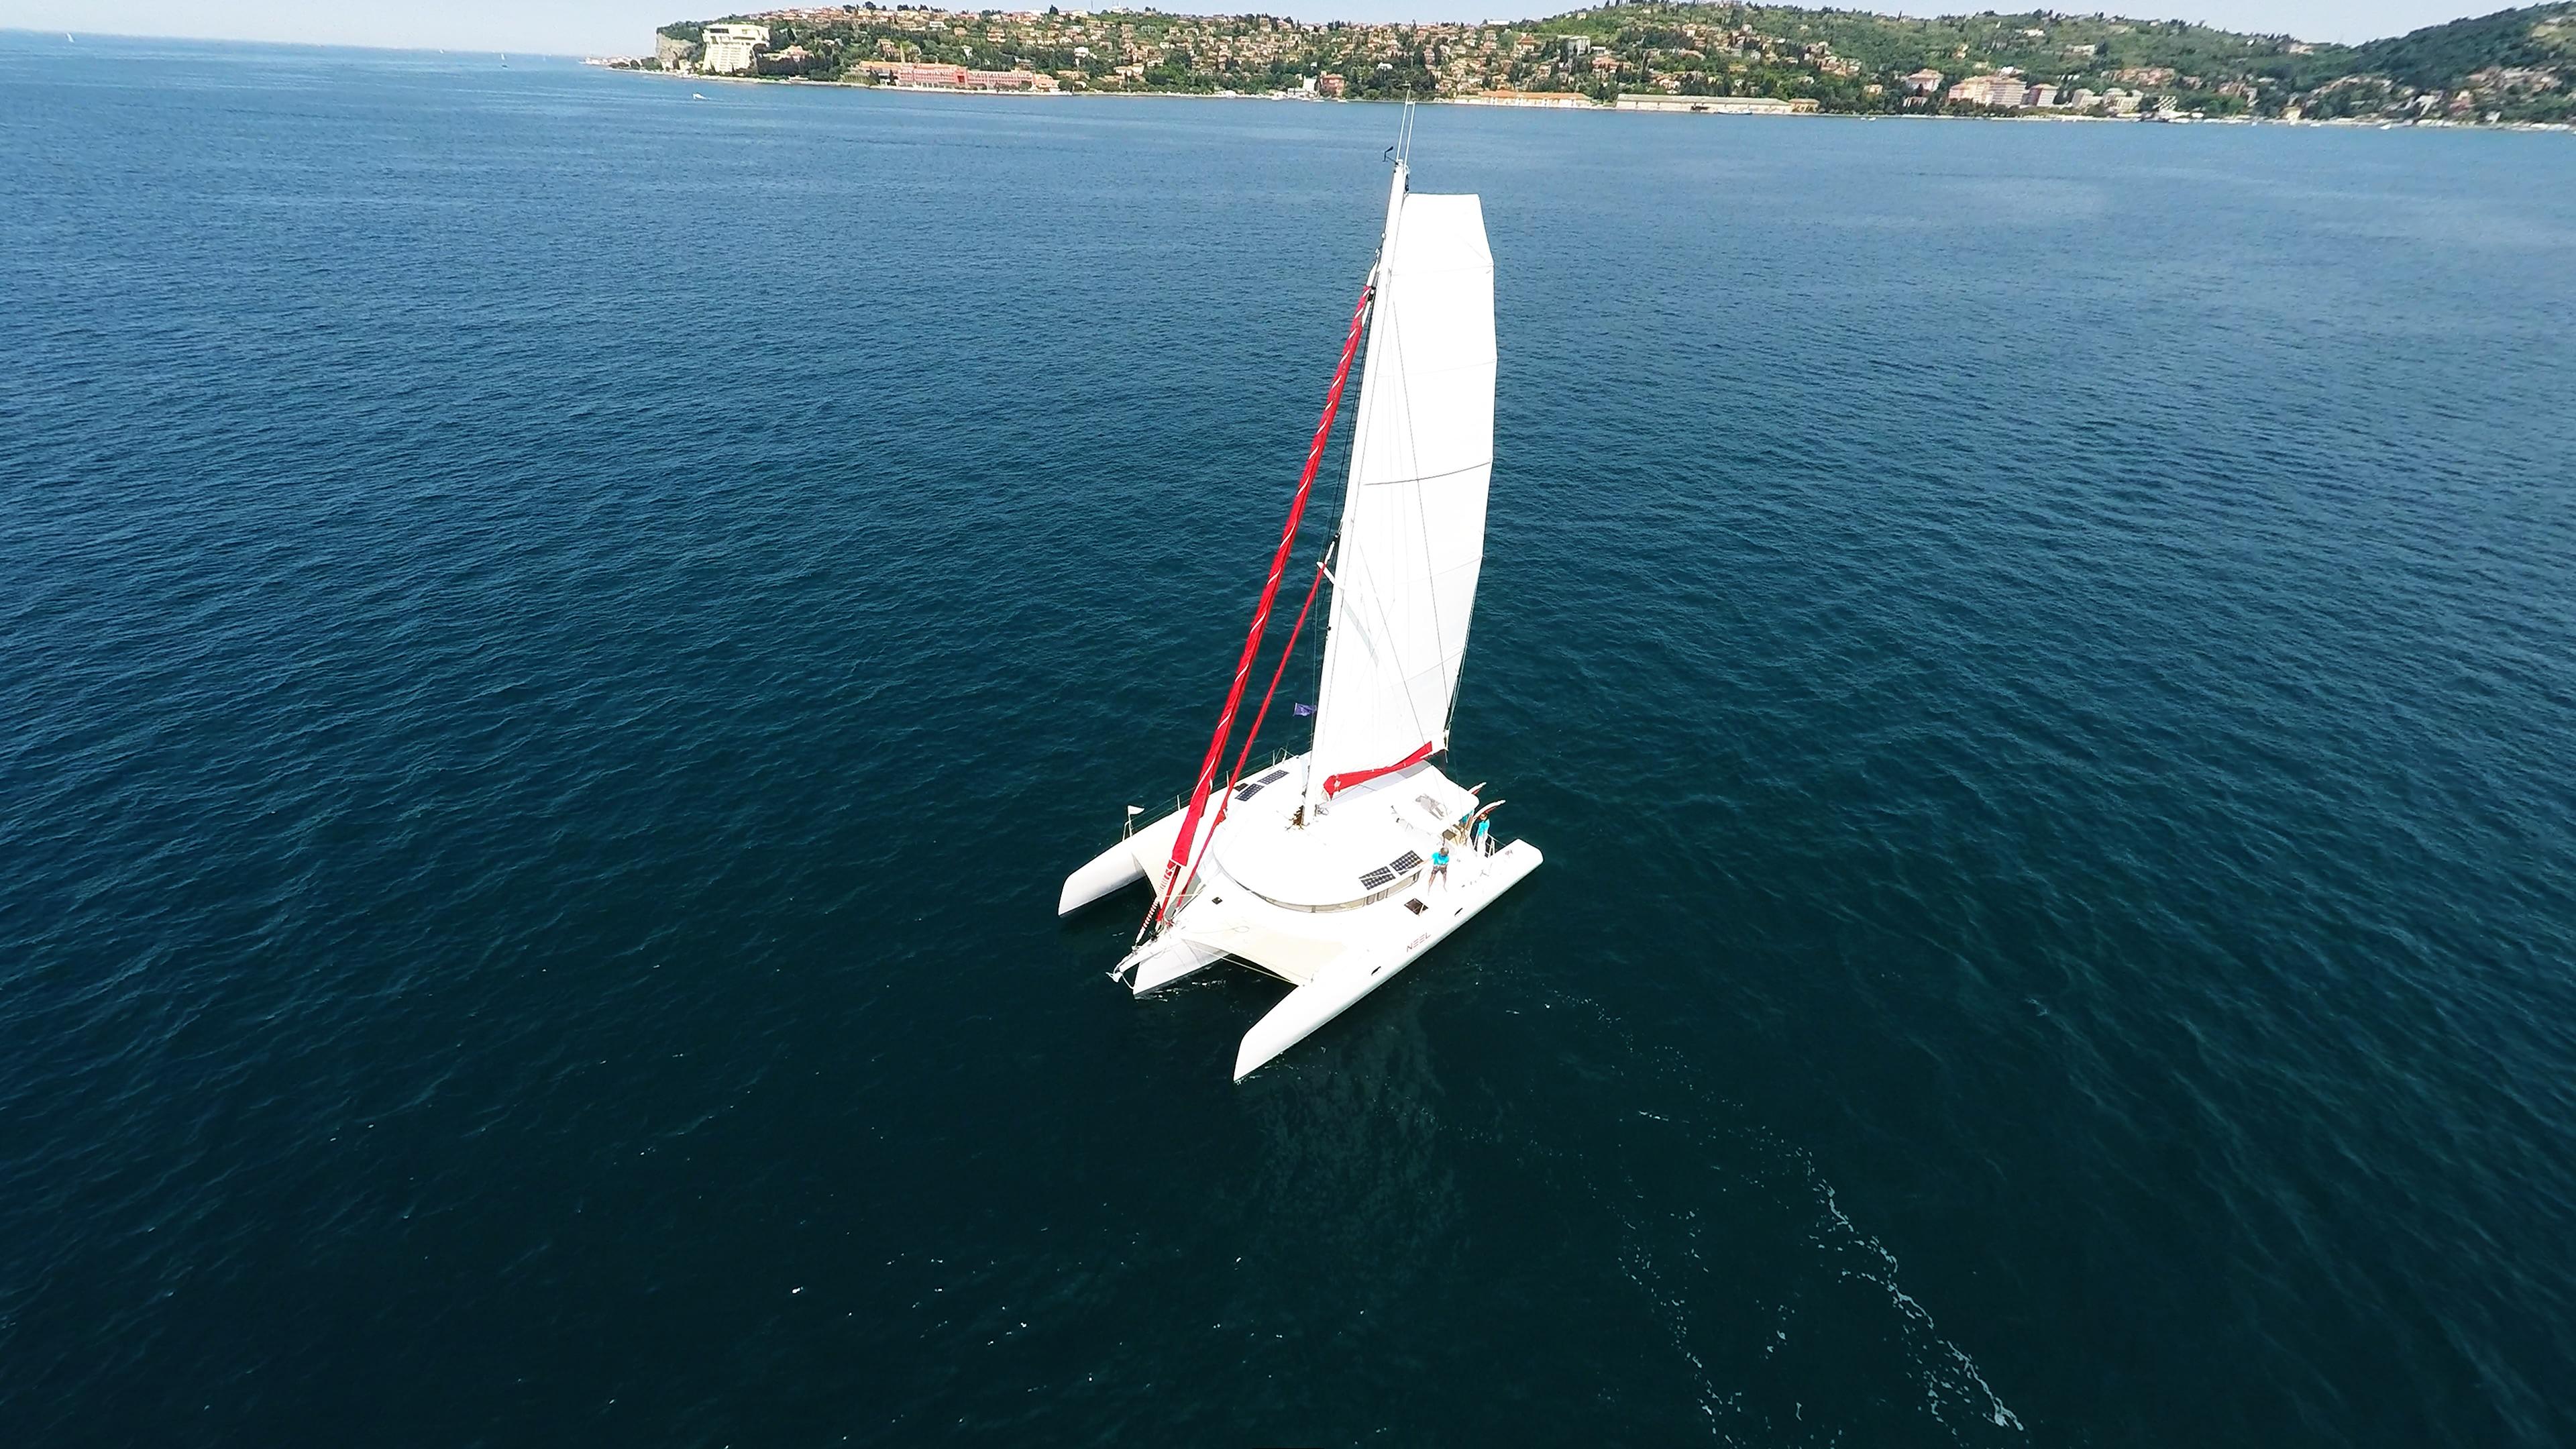 bianco trimarano yacht naviga a vela al blu mare 1